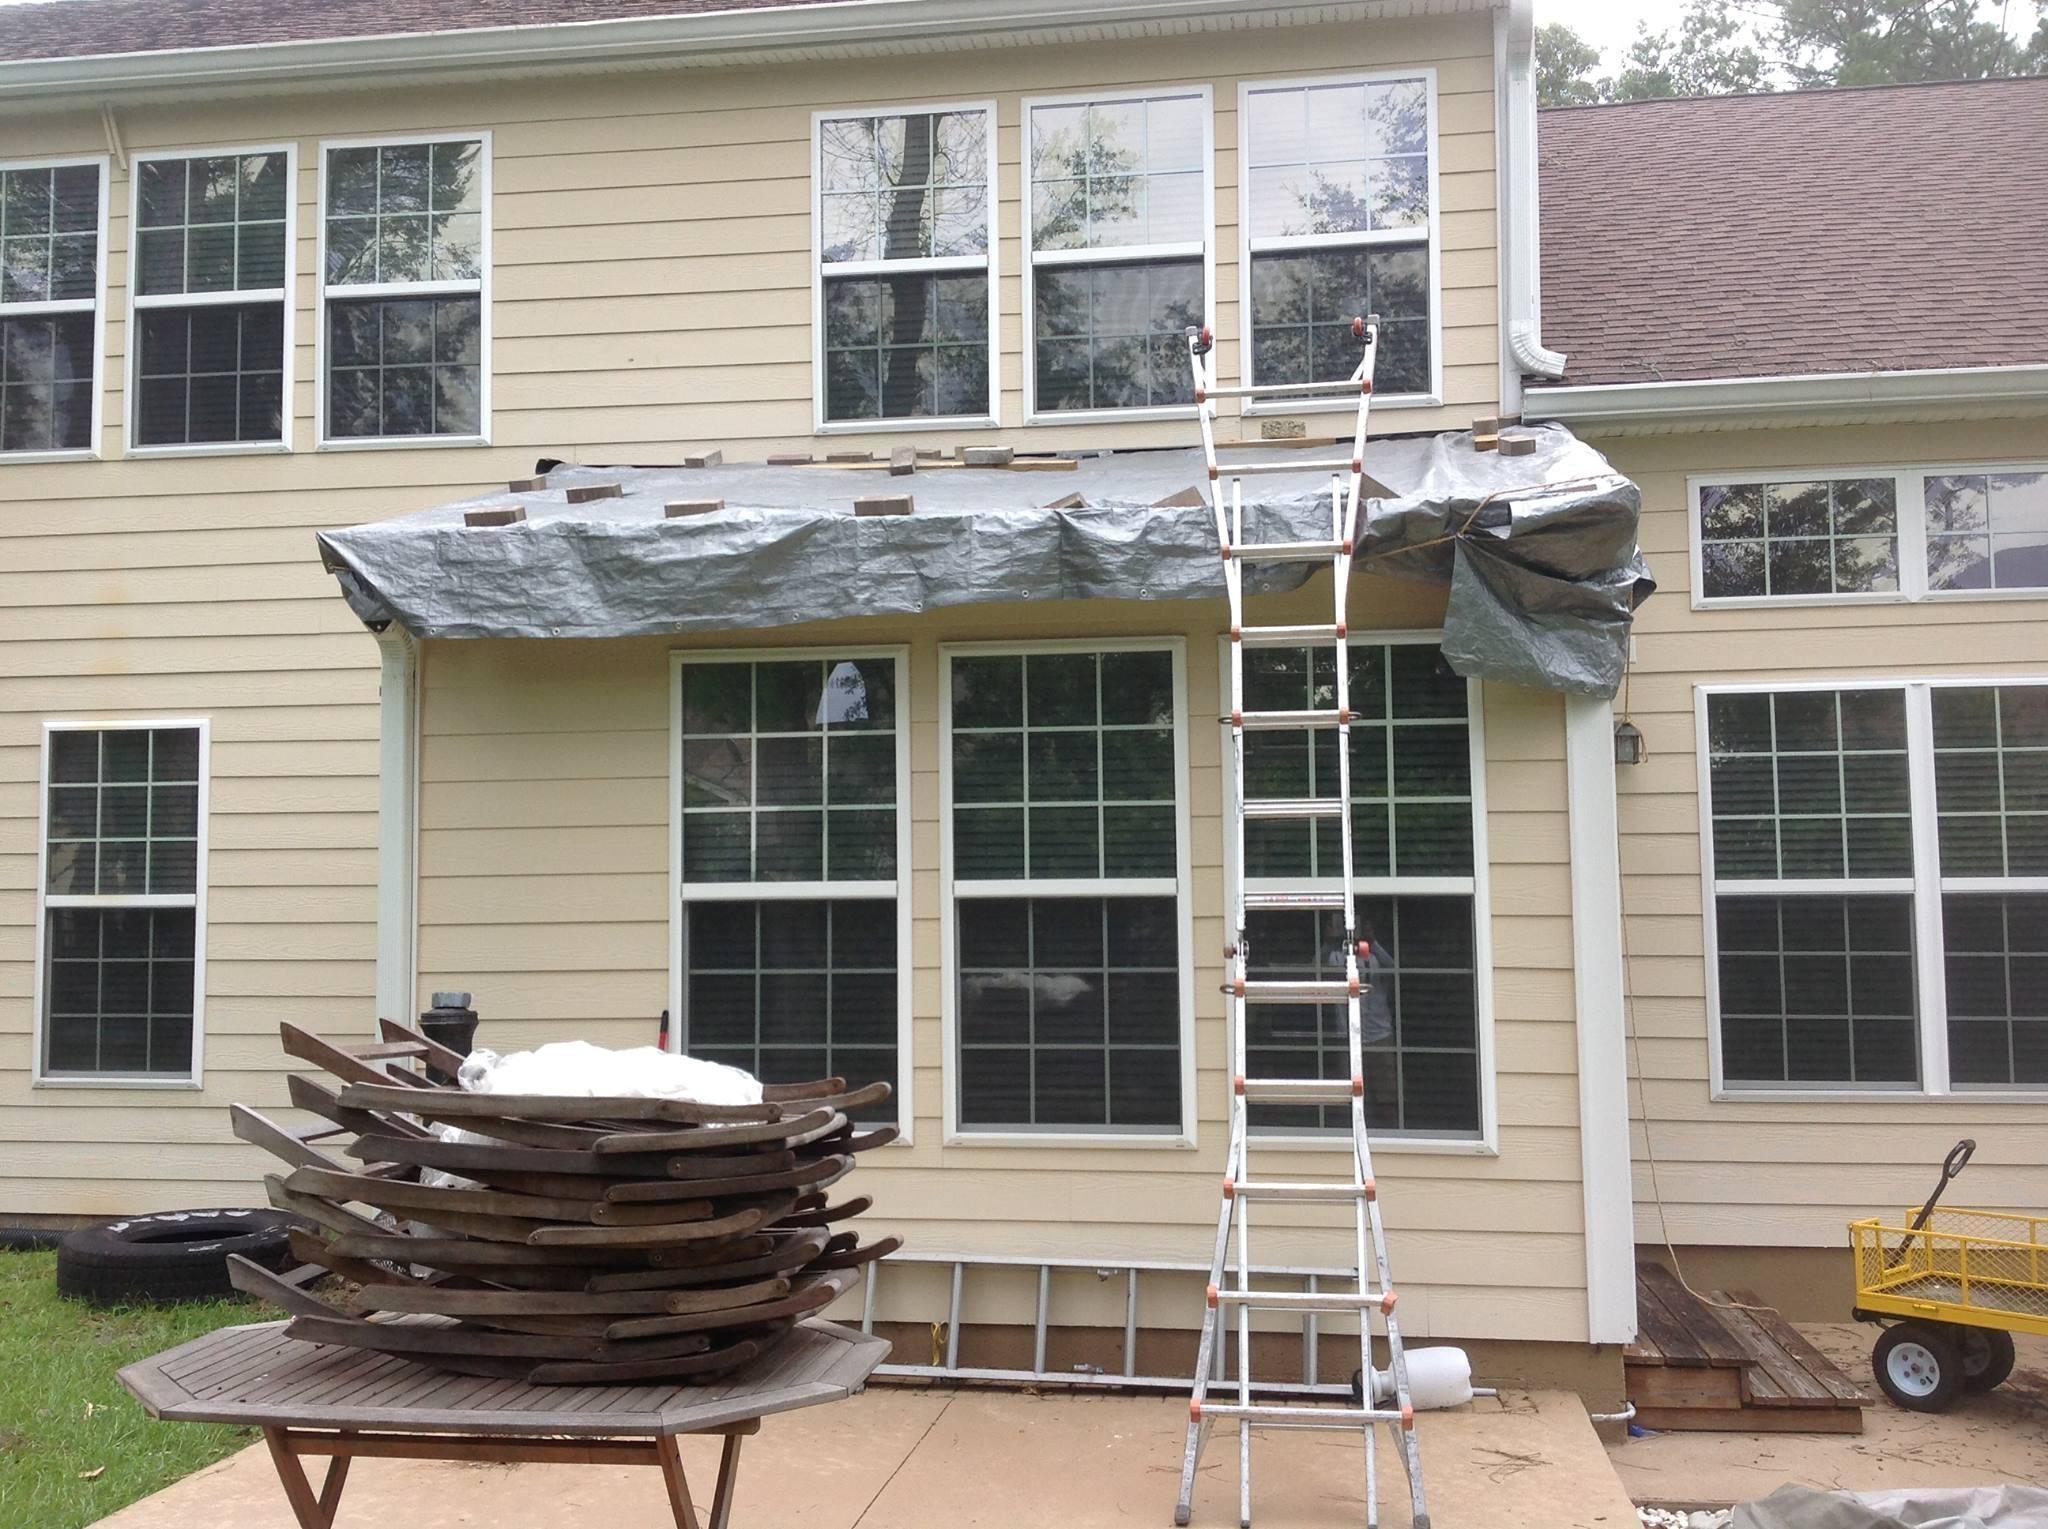 RoofCrafters-Savannah image 83